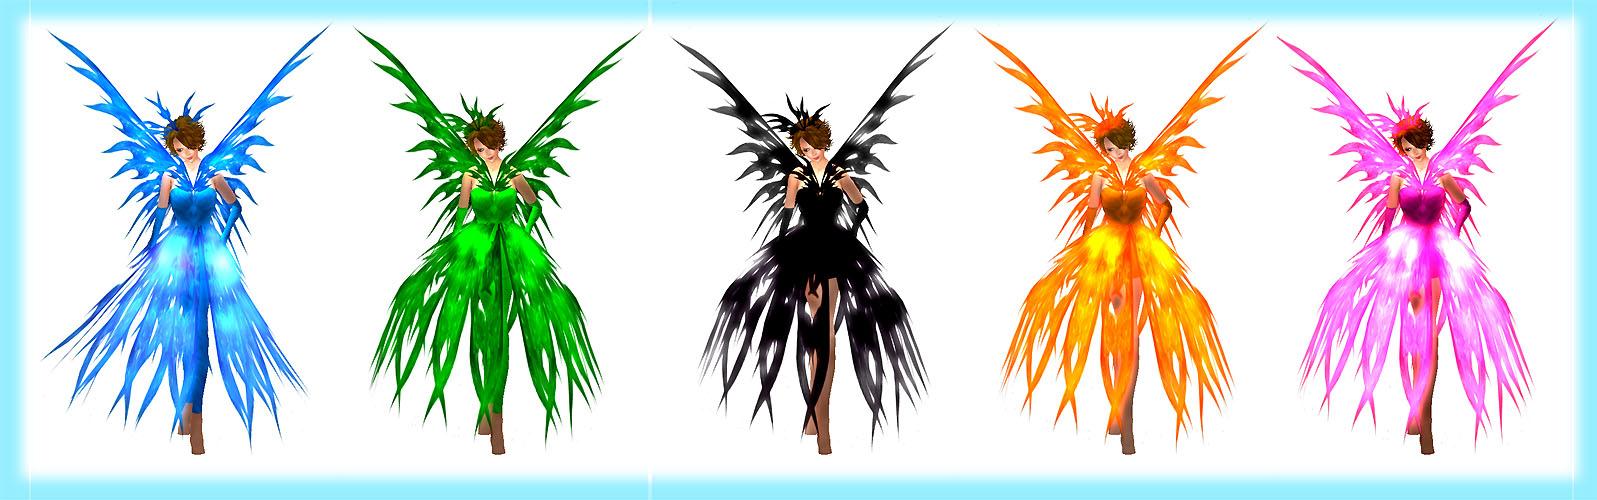 Fire Fairy1